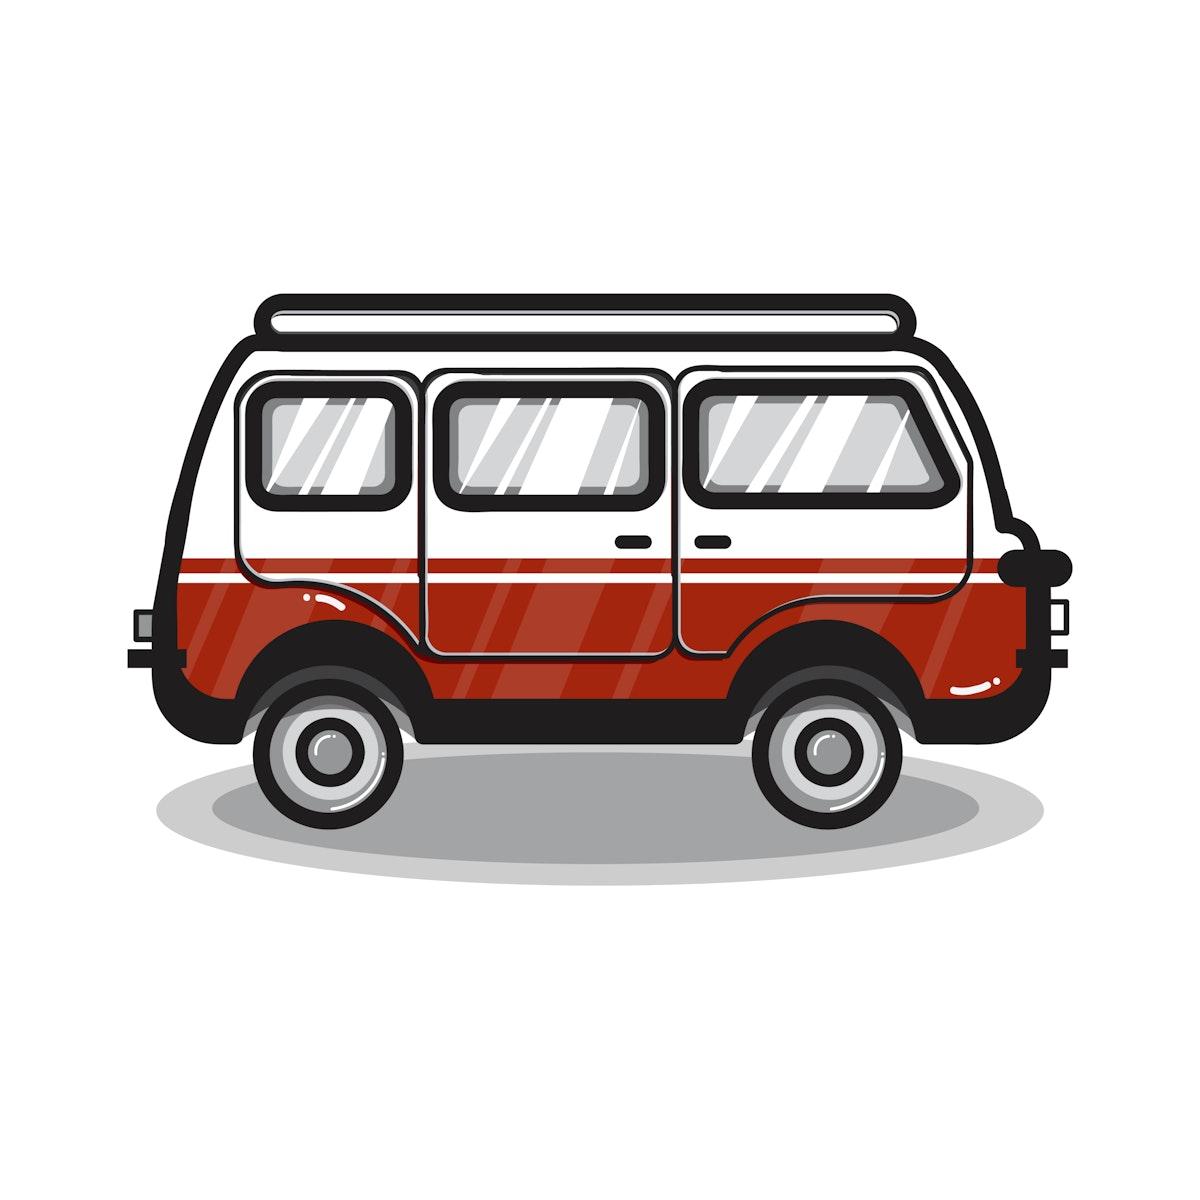 Hand drawn multi-purpose vehicle car illustration